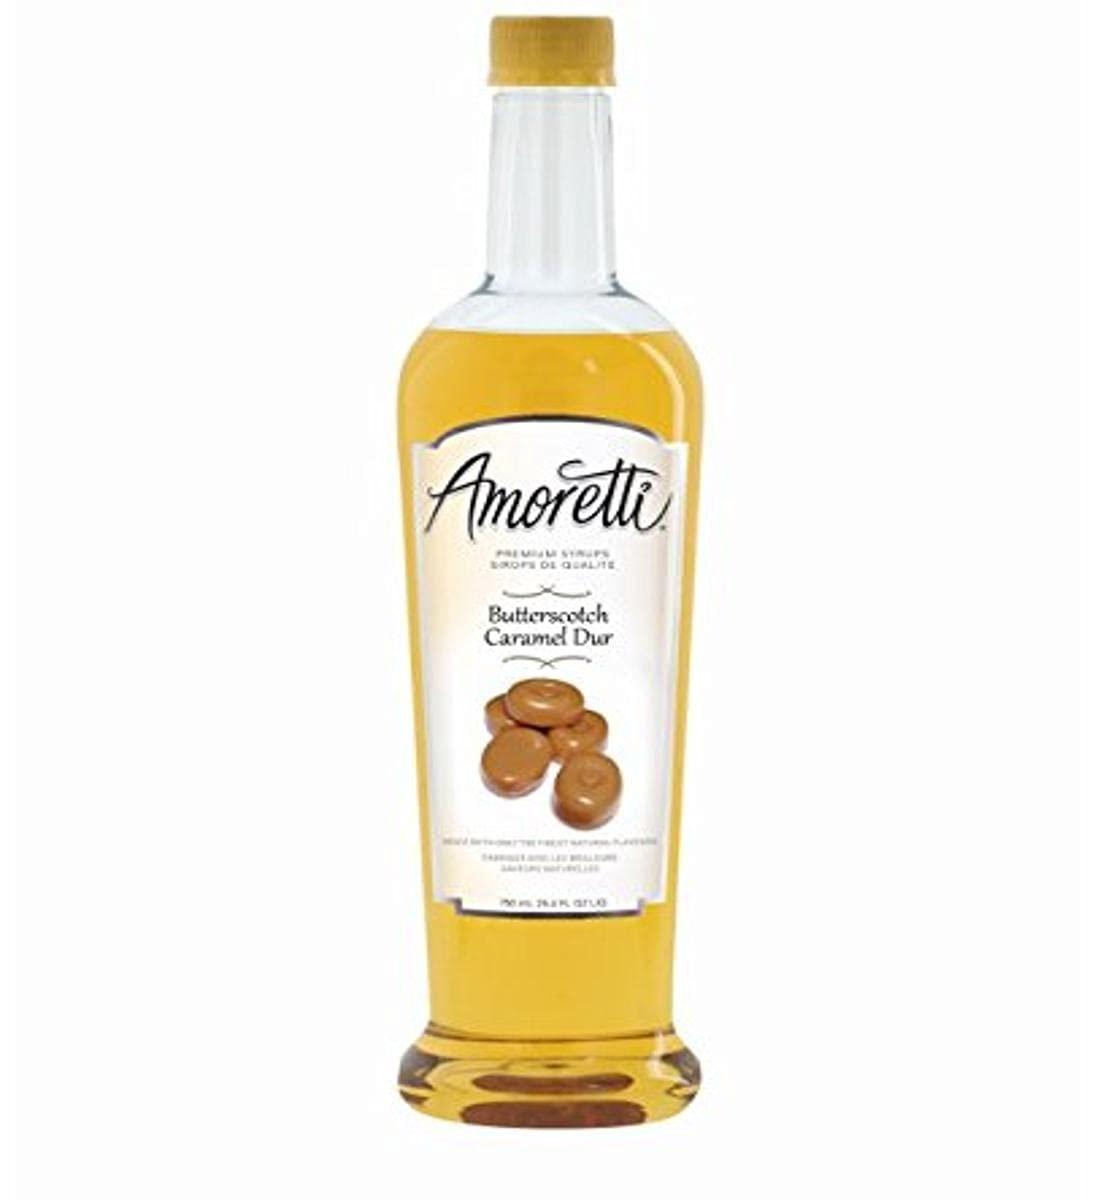 Amoretti Premium Syrup, Butterscotch, 25.4 Ounce